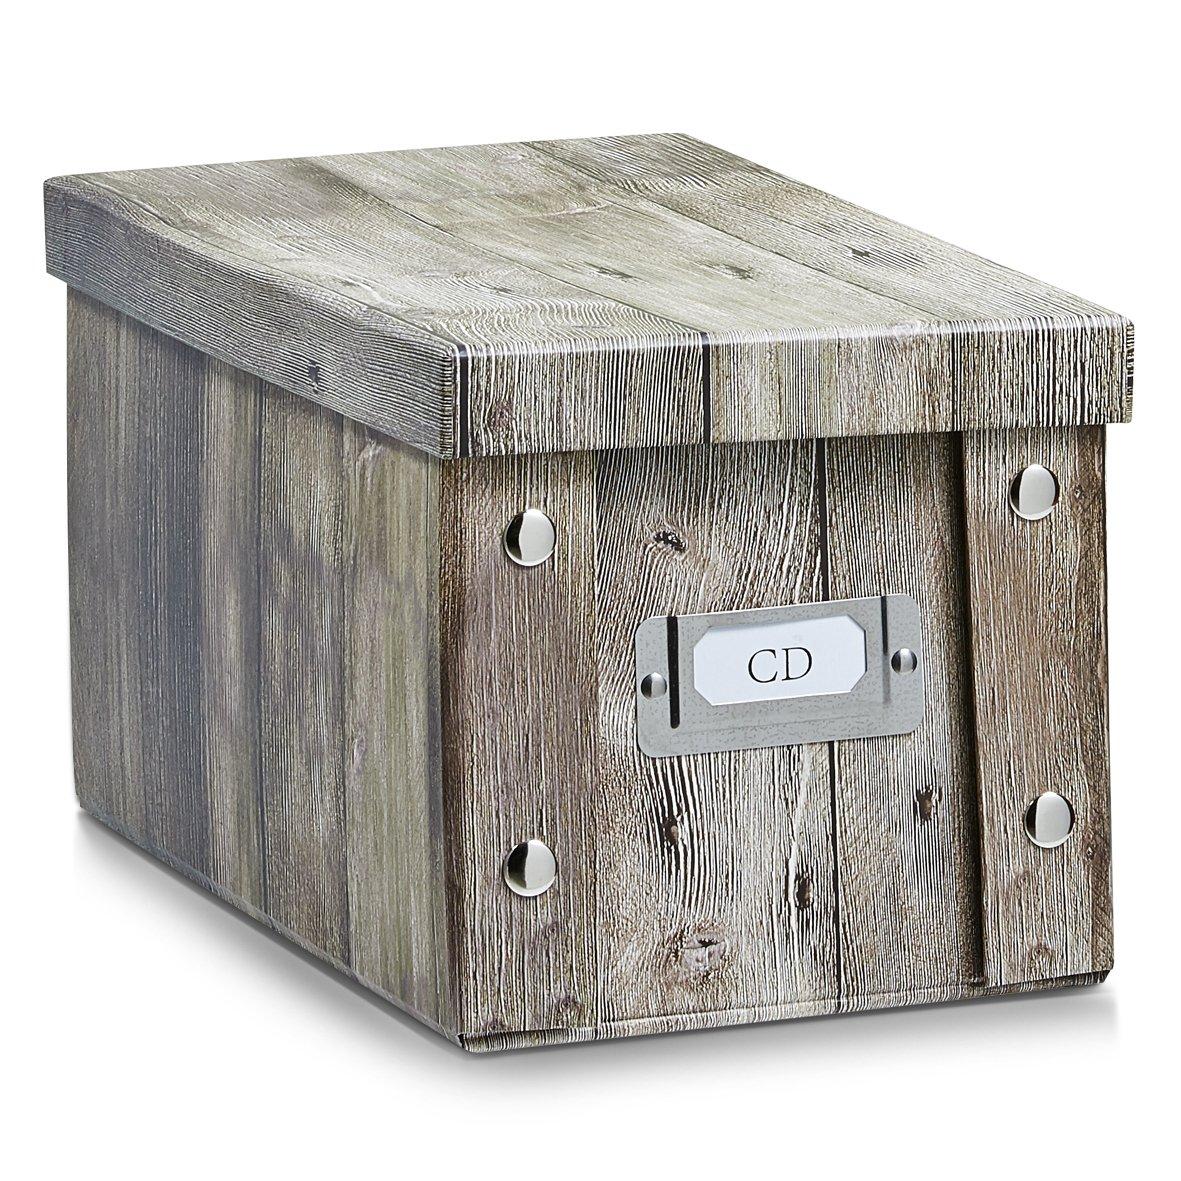 Caja de cartón vintage marronhttps://amzn.to/2Dg24Pv